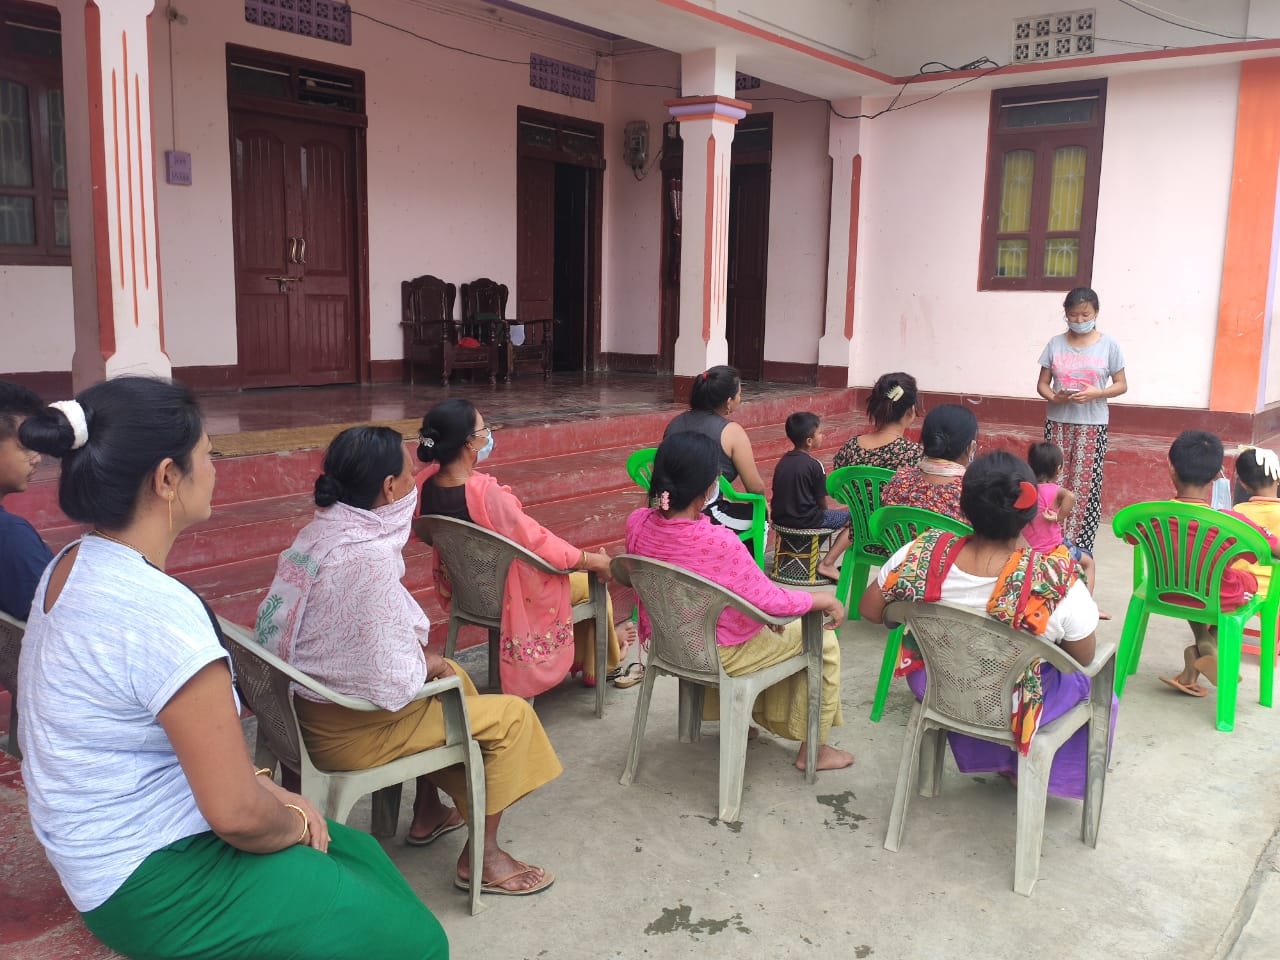 Huidrom Sarjubala Devi at Wangbal, Thoubal district